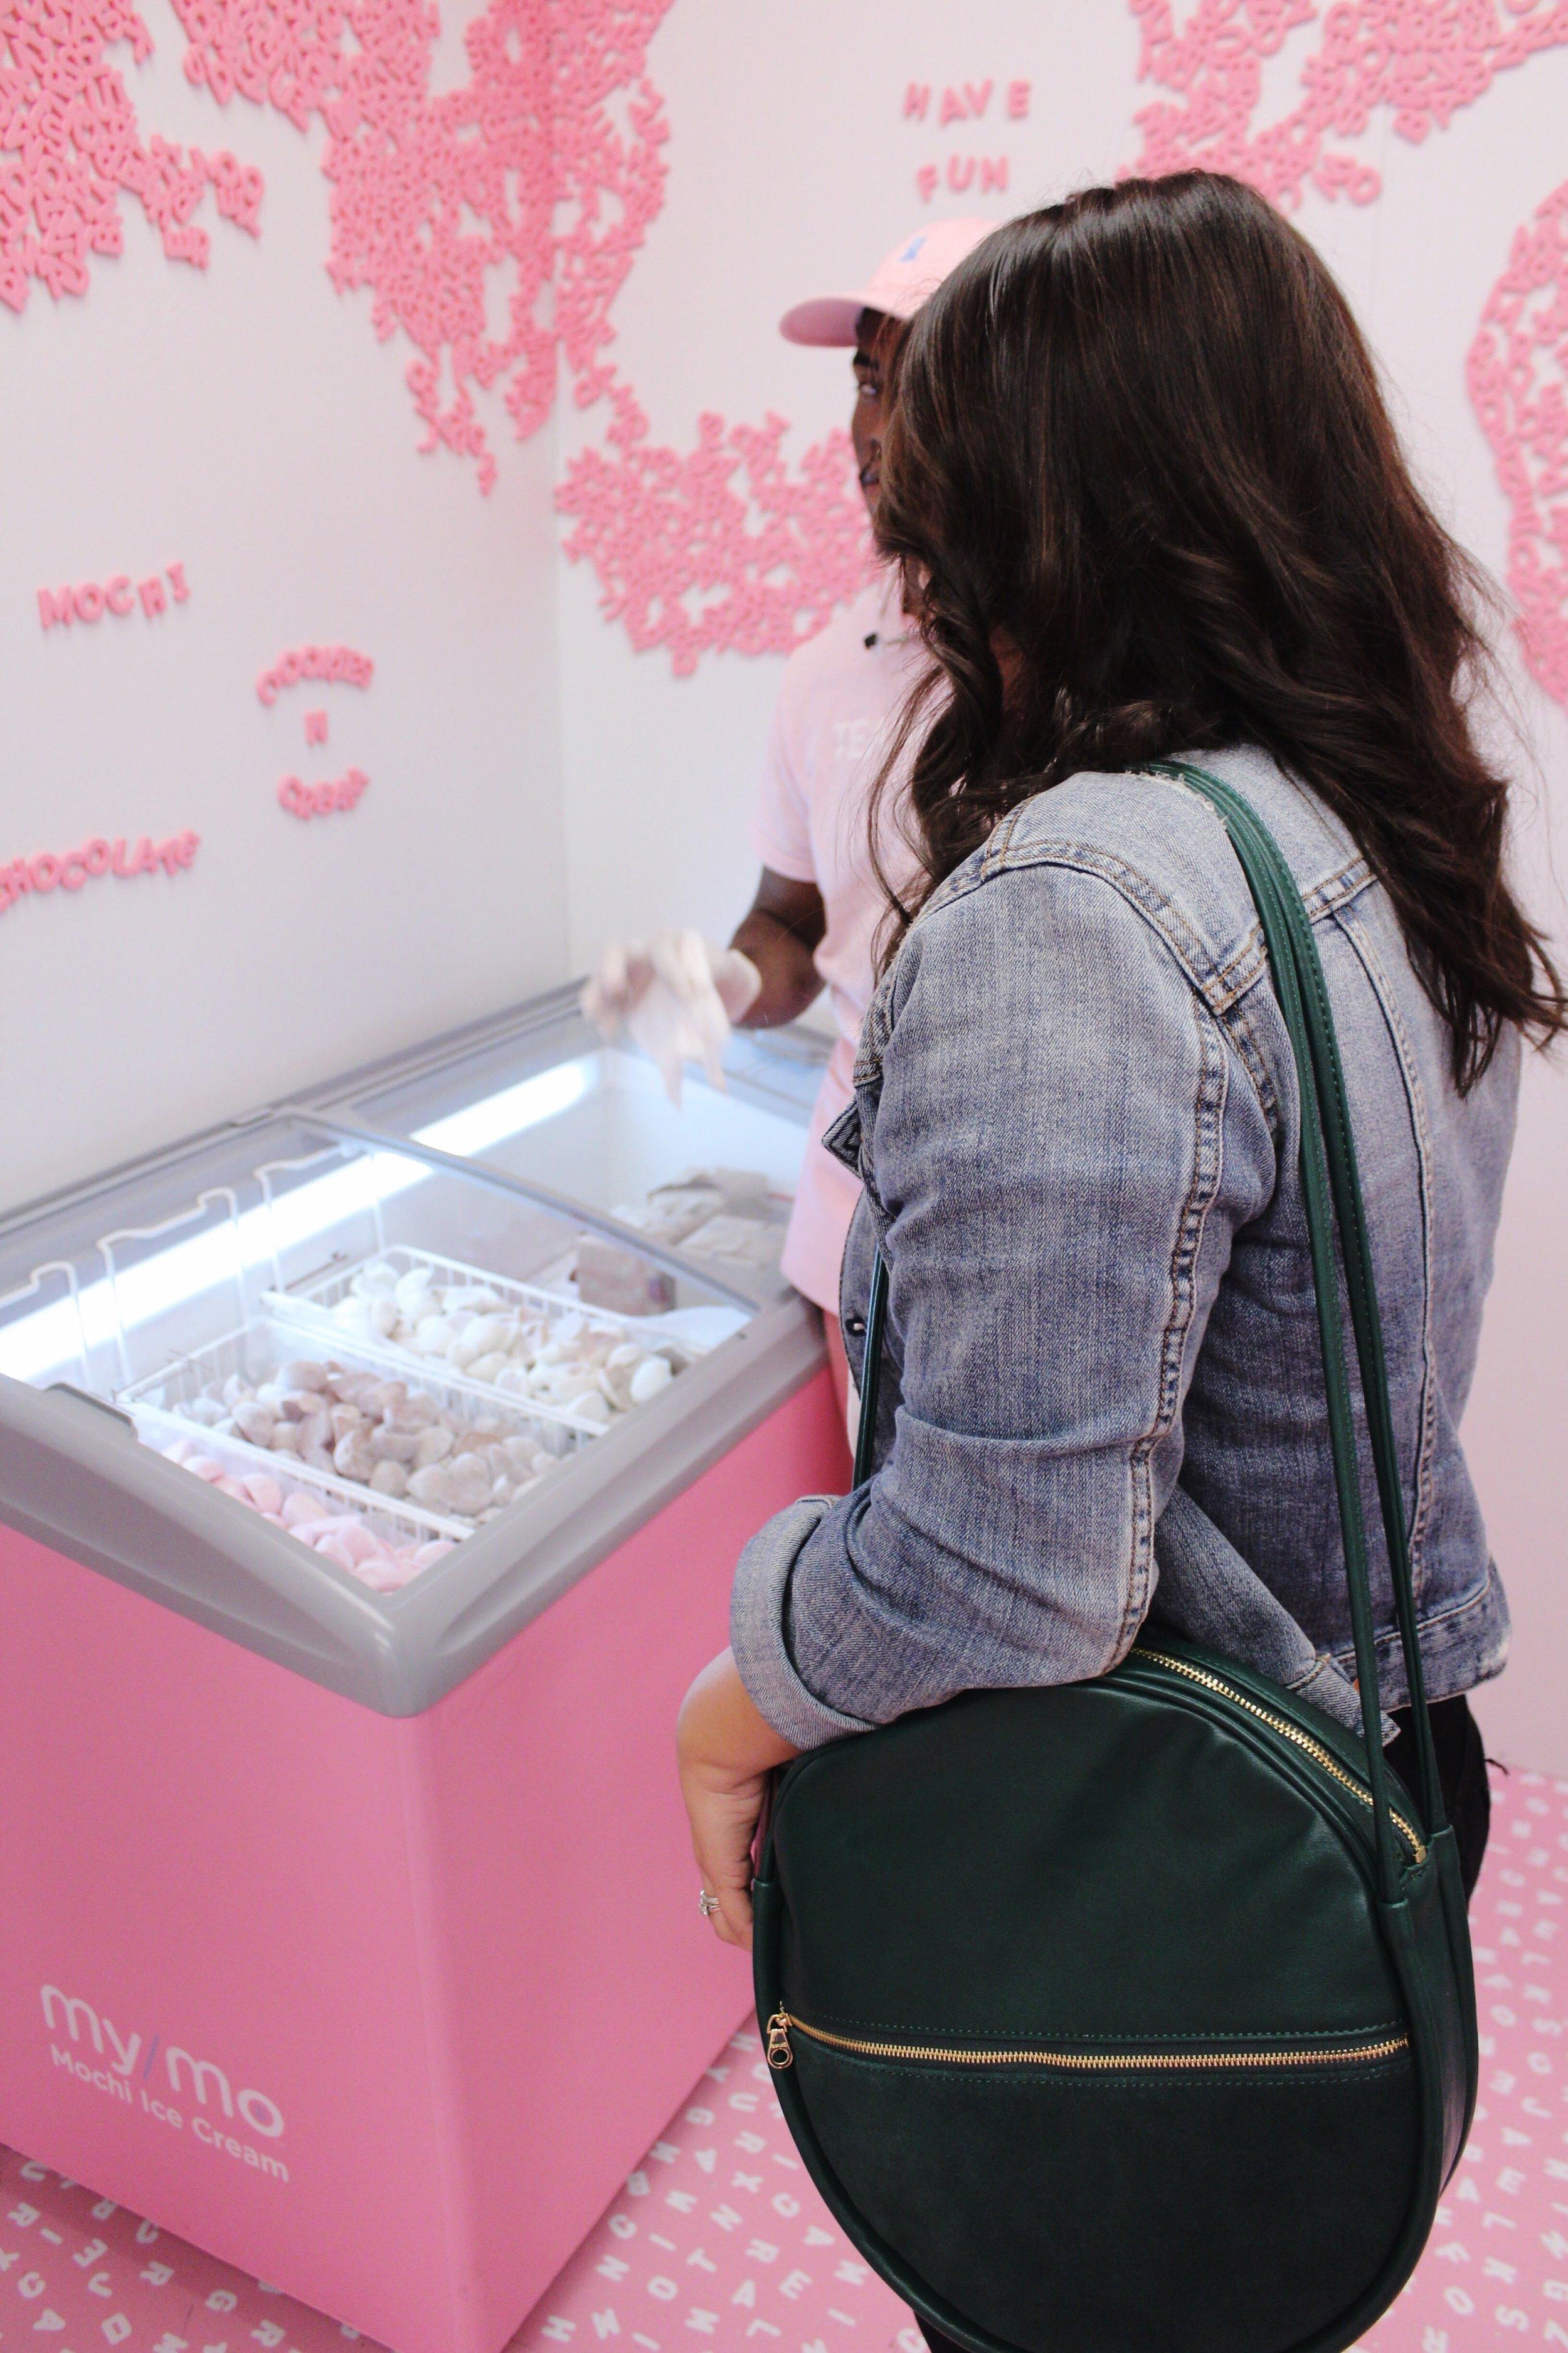 Ban.do bag, denim jacket, museum of ice cream, mochi, pink magnetic letters